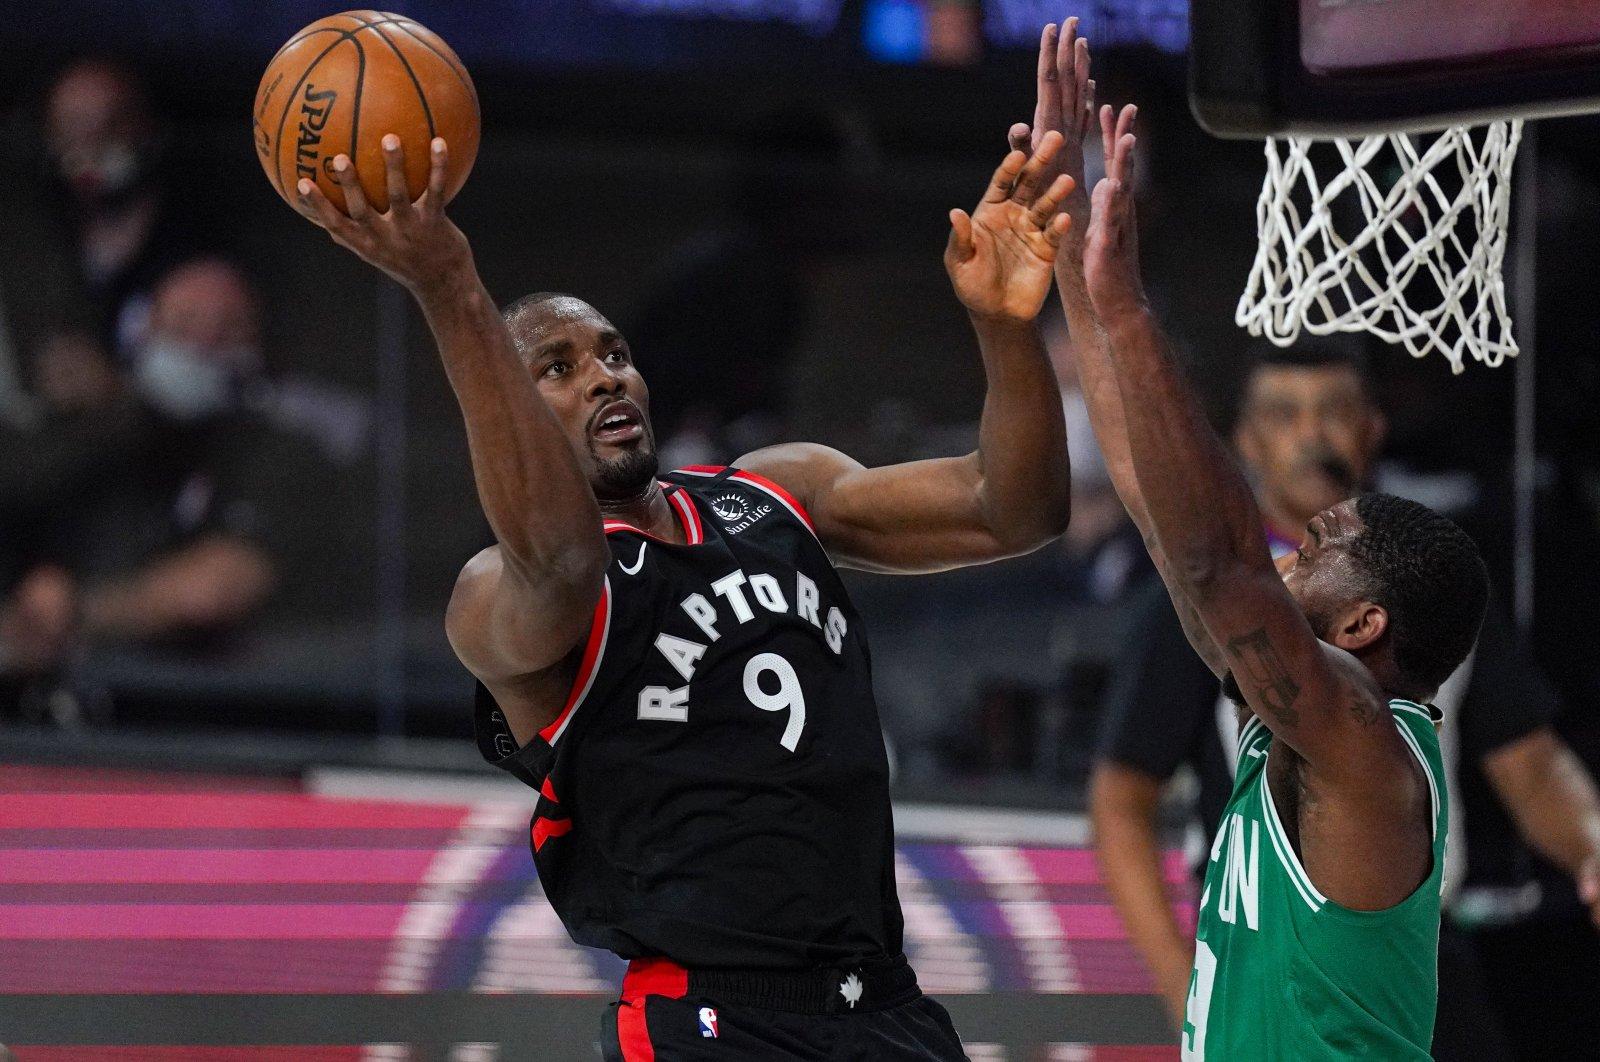 Toronto Raptors' Serge Ibaka (L) shoots over Boston Celtics' Brad Wanamaker during an NBA playoff basketball game in Lake Buena Vista, U.S., Sept. 9, 2020. (AP Photo)